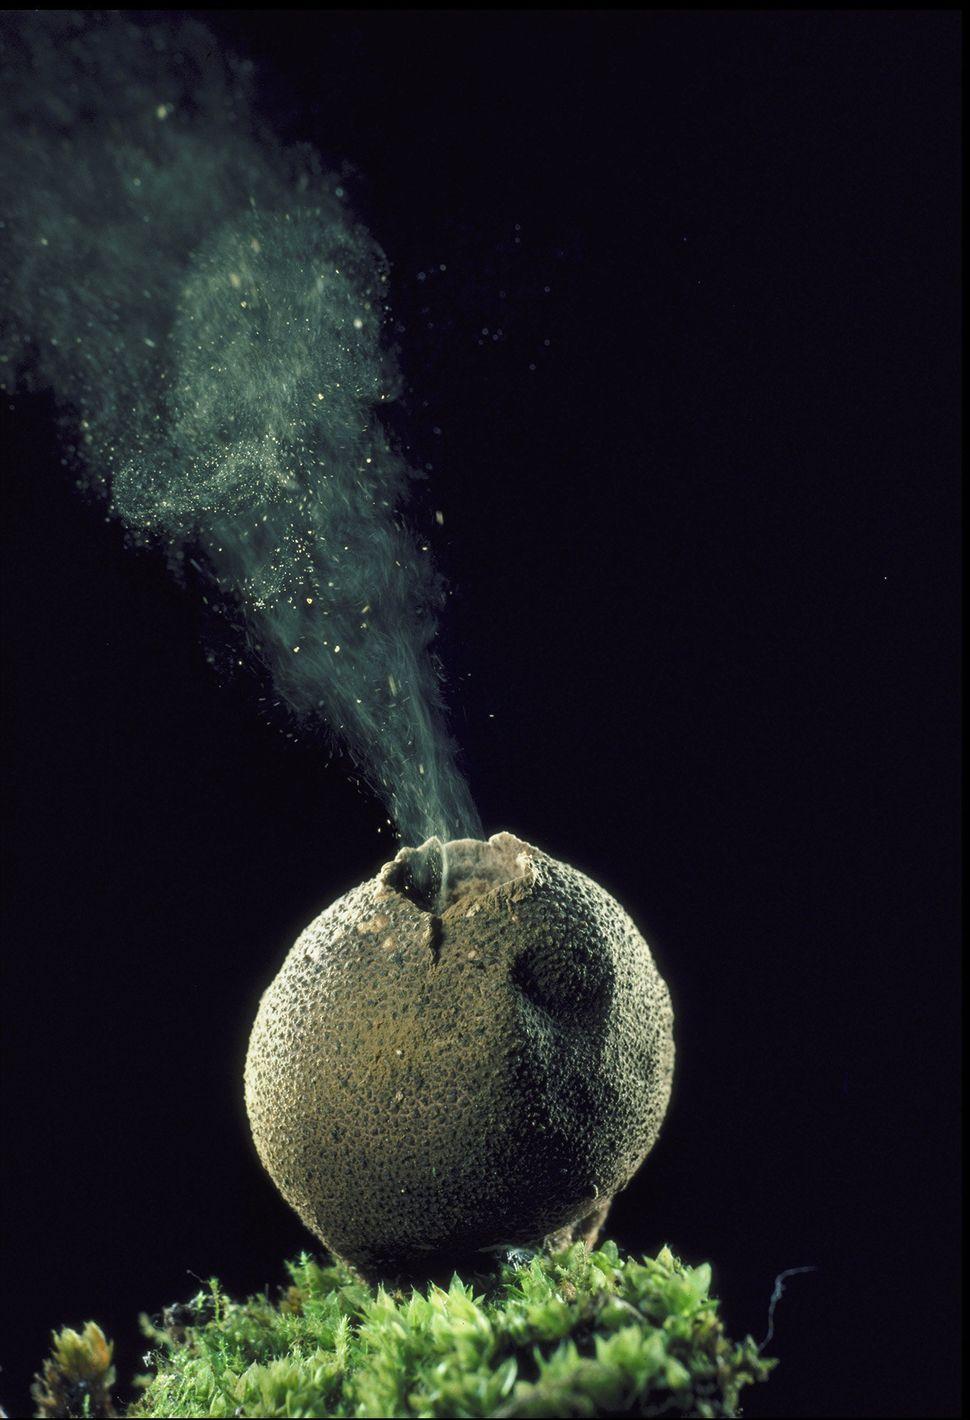 Lycoperdon pyriform (Puffball)